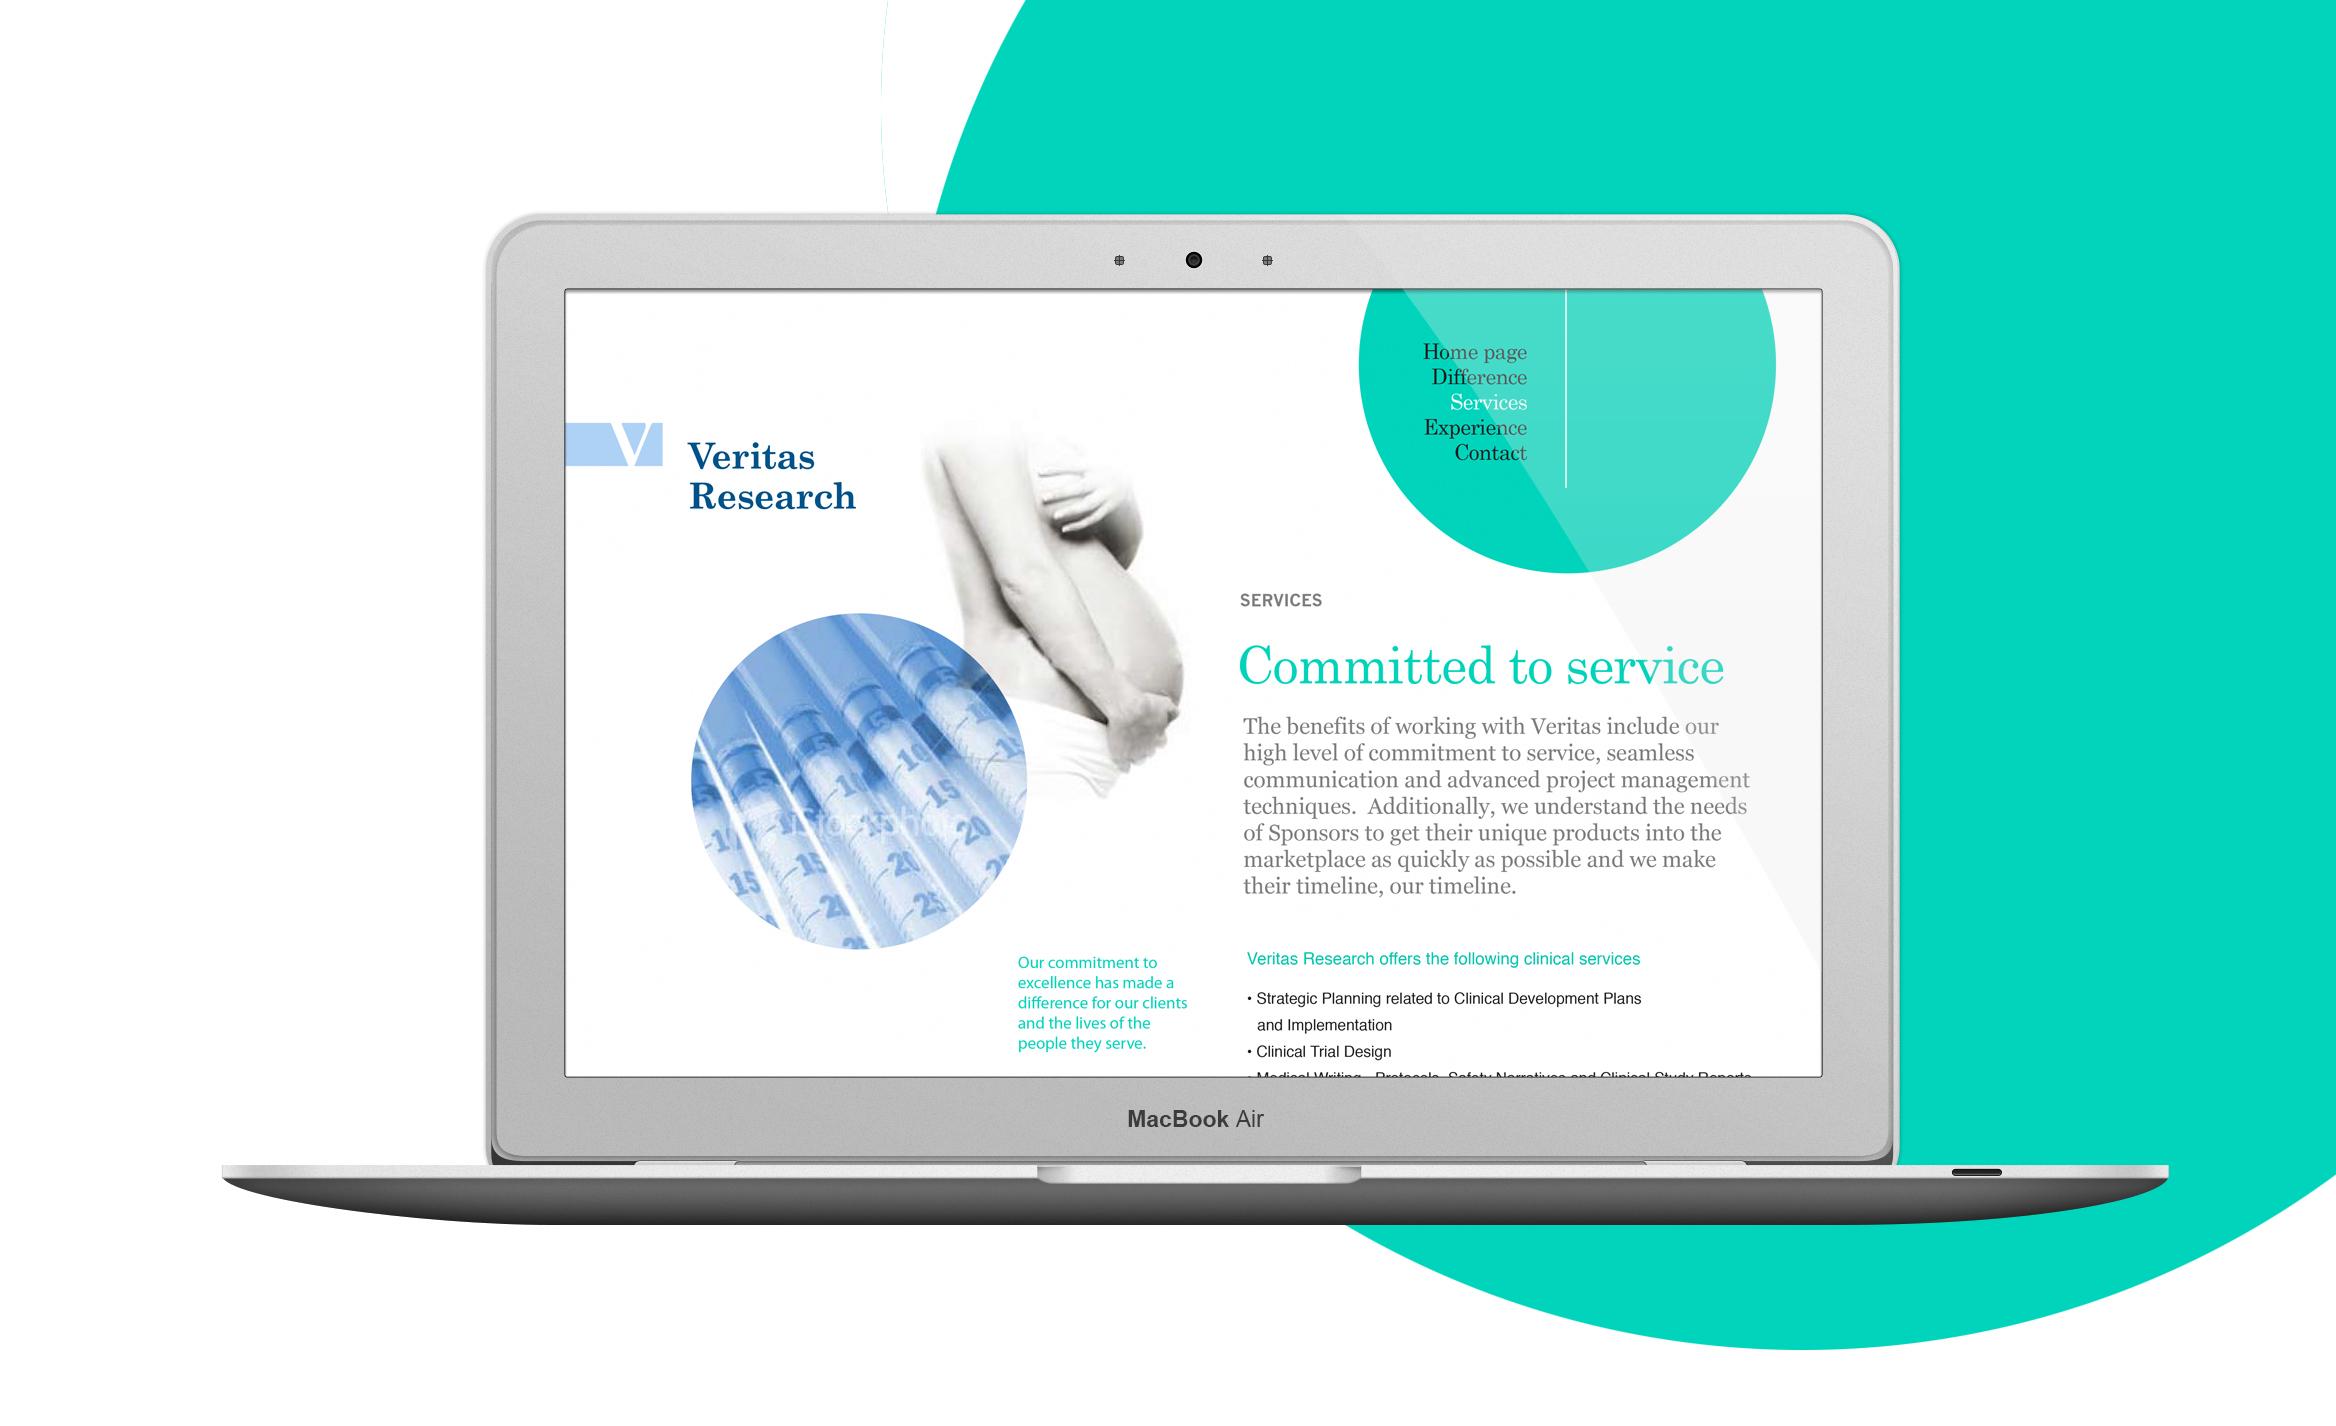 Veritas Research website design 2